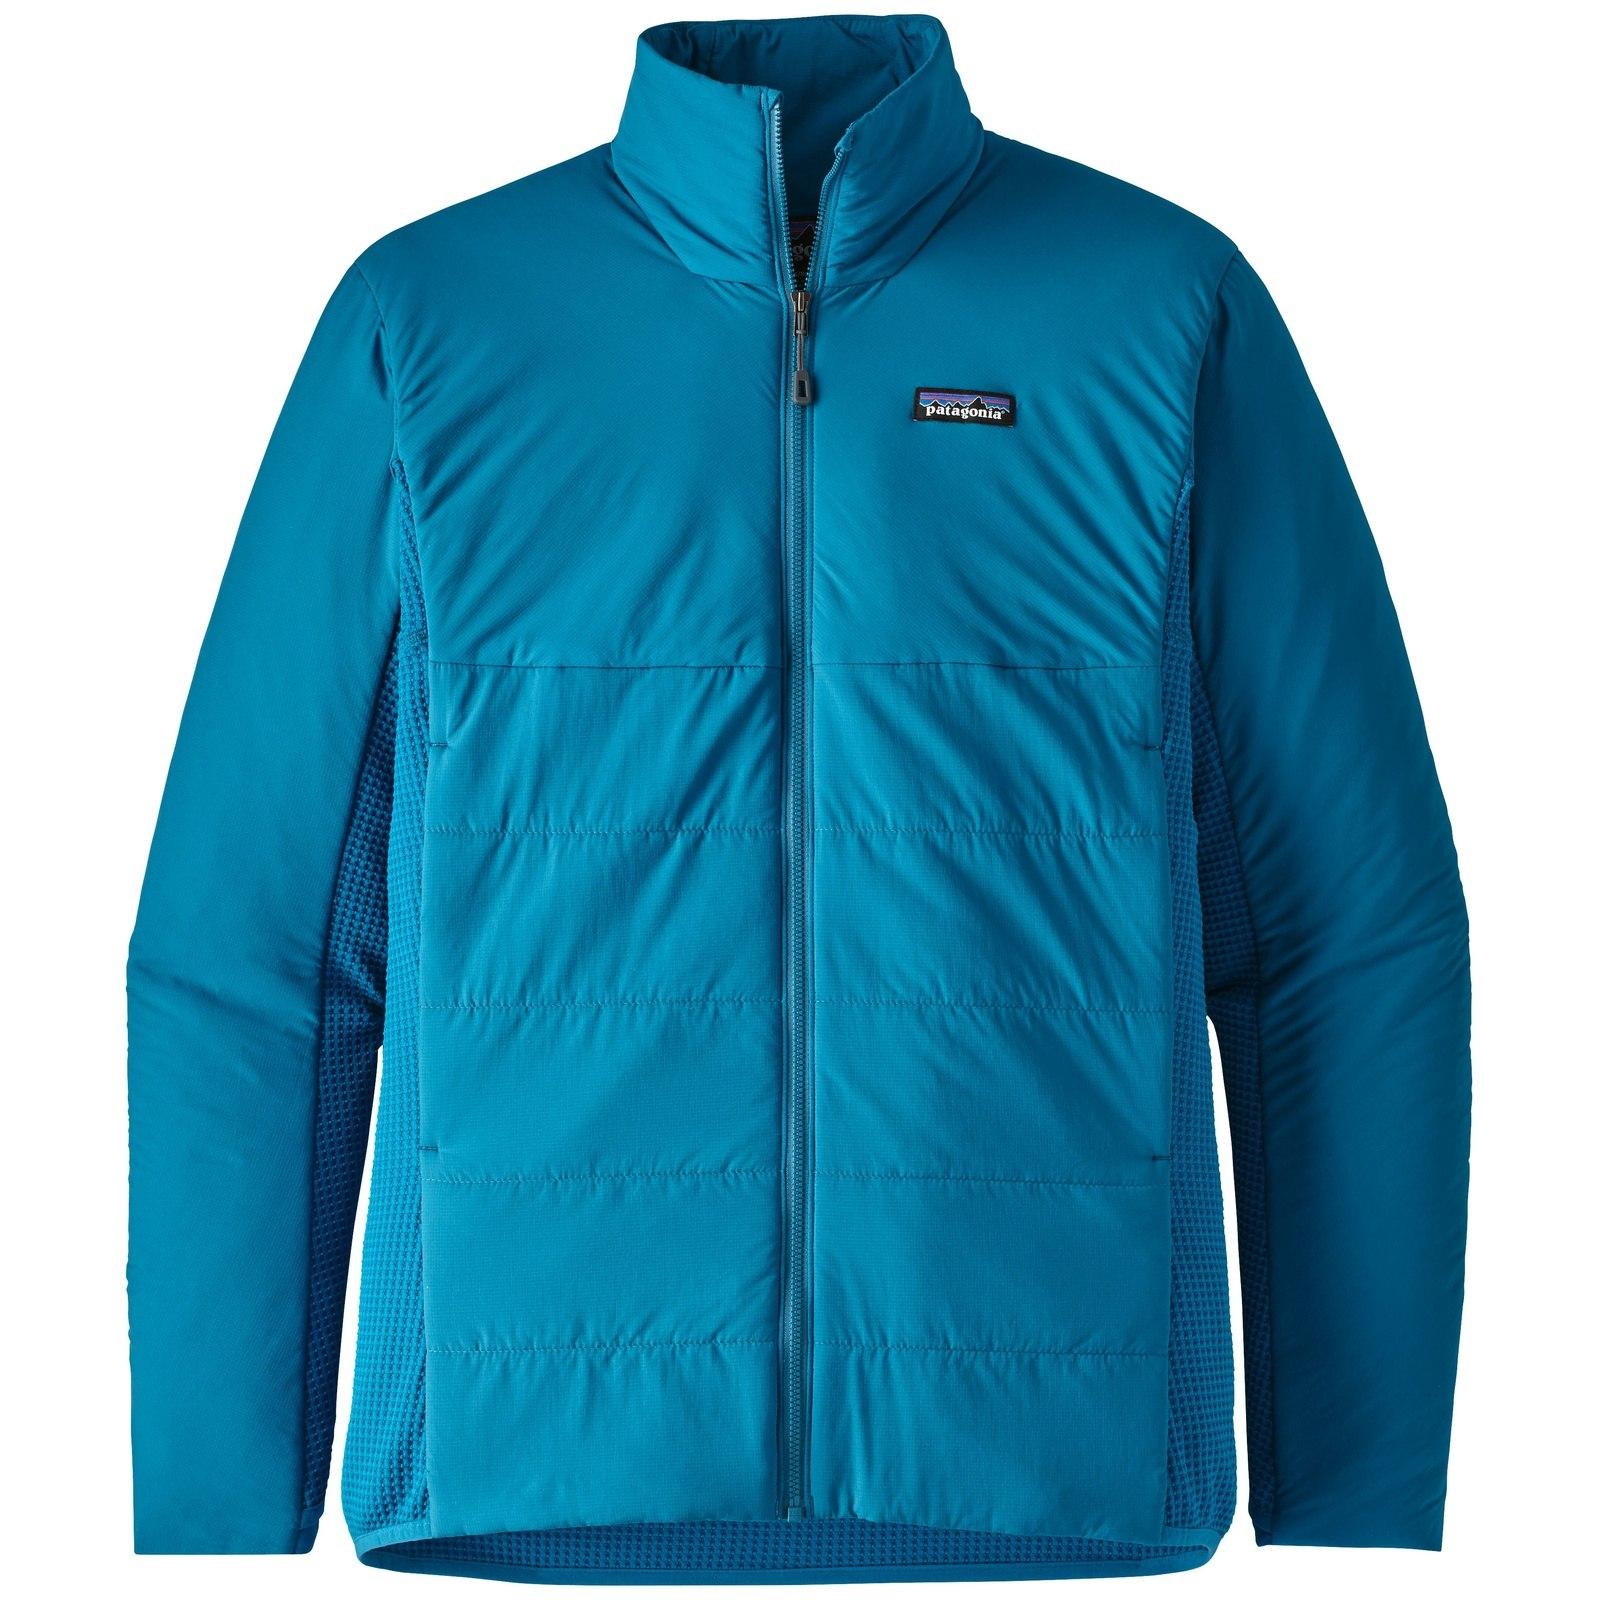 New Patagonia  Nano-Air Light Hybrid Men'S Long Sleeve Jacket